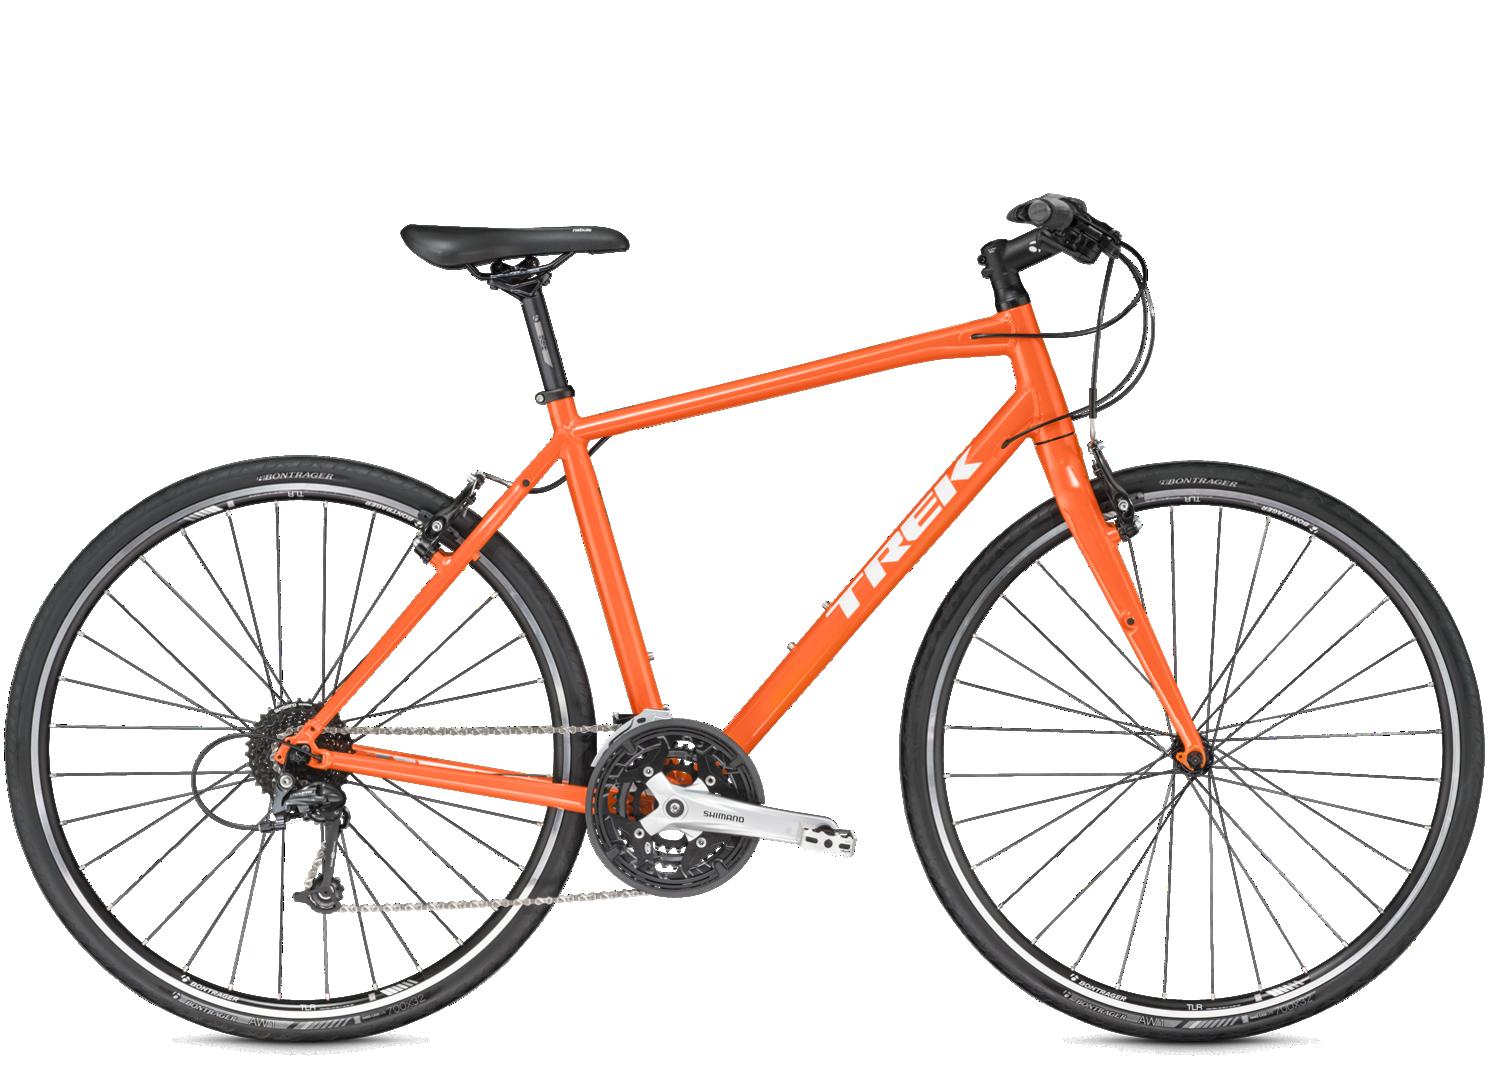 Bicycle Tune Up >> 2016 7.4 FX - Bike Archive - Trek Bicycle